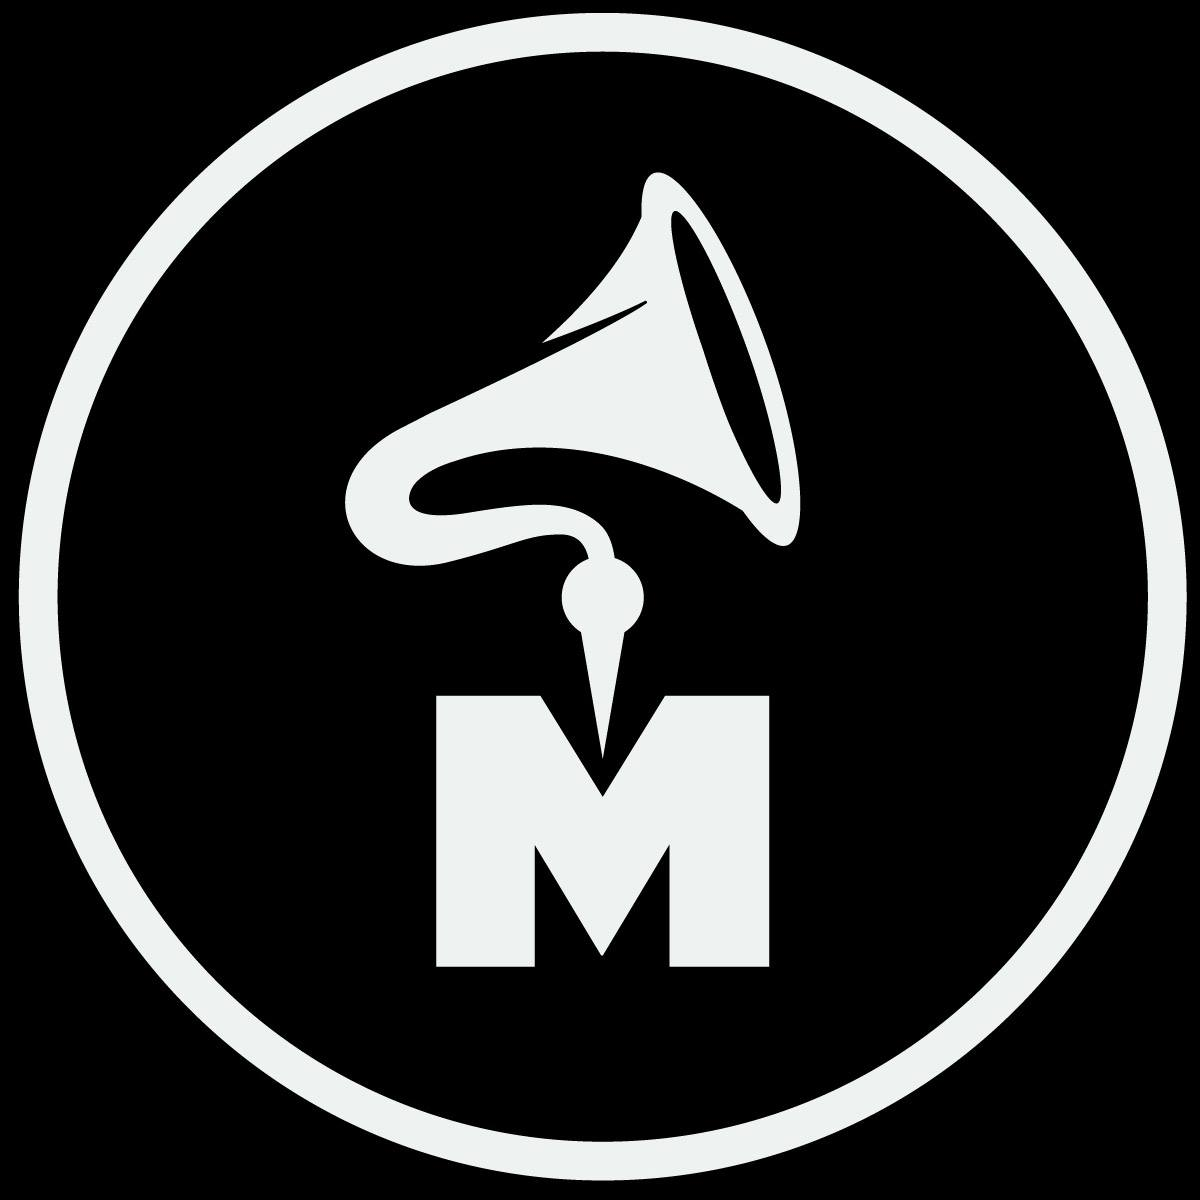 www.megaphono.tv